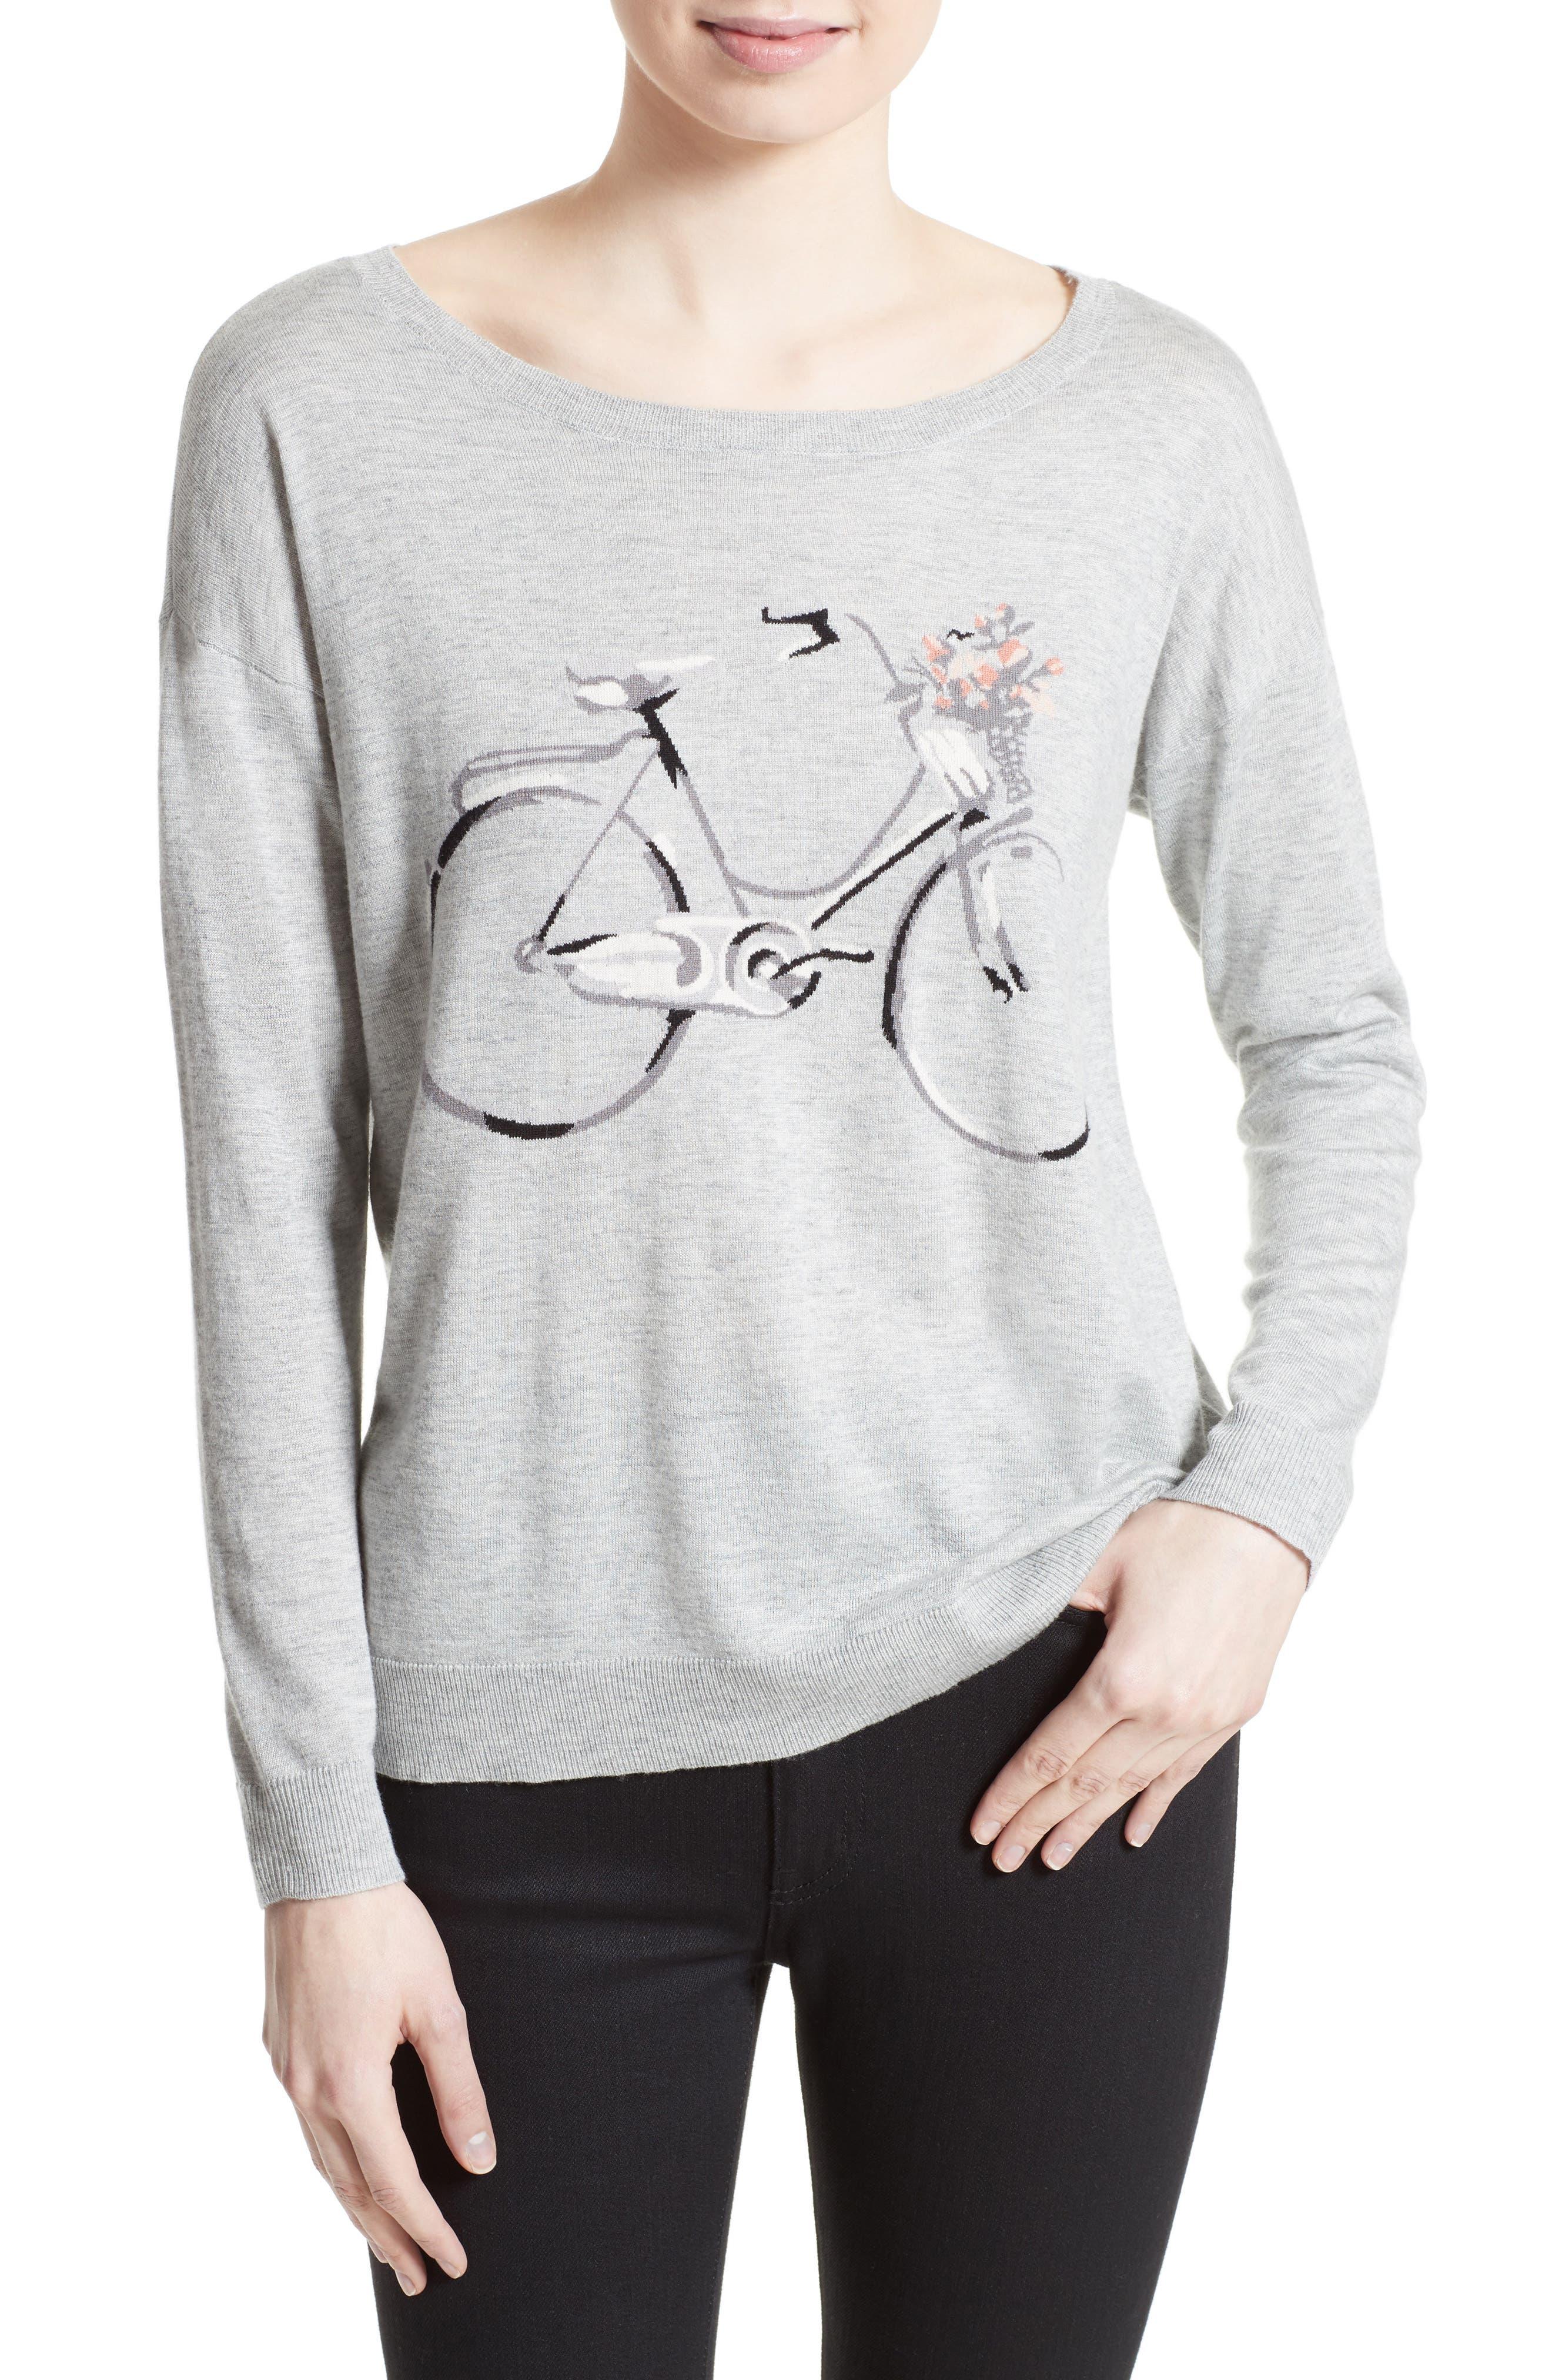 JOIE Eloisa Sweater, Main, color, 051